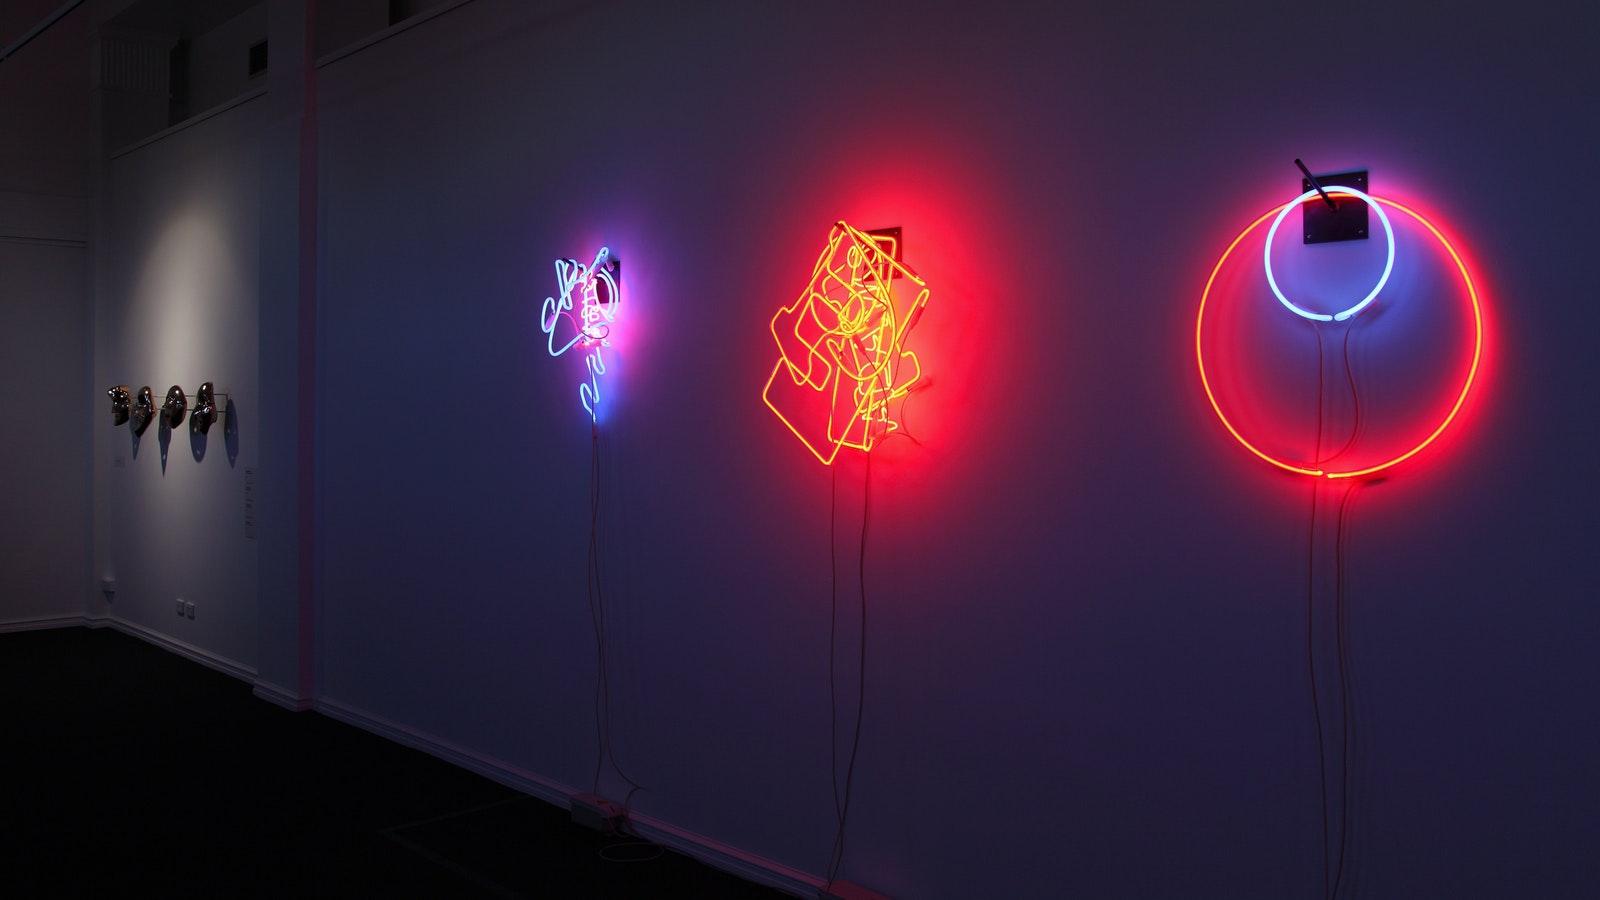 Bronze wall pieces by Darren Sylvester and neon works by Brendan Van Heck